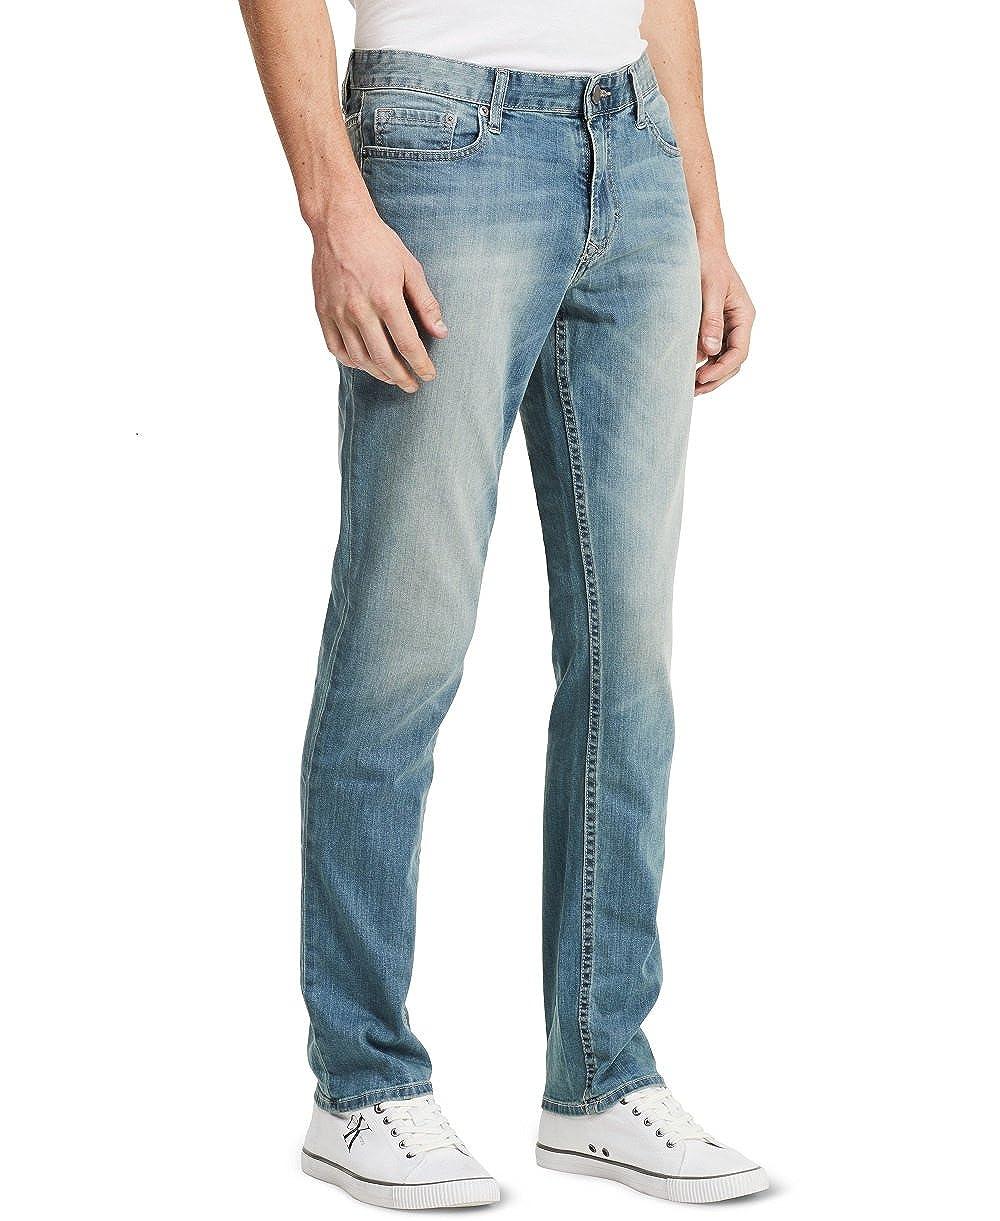 Calvin Klein Jeans Men's Slim Straight-Leg Jean In Silver Bullet 41BA728-470